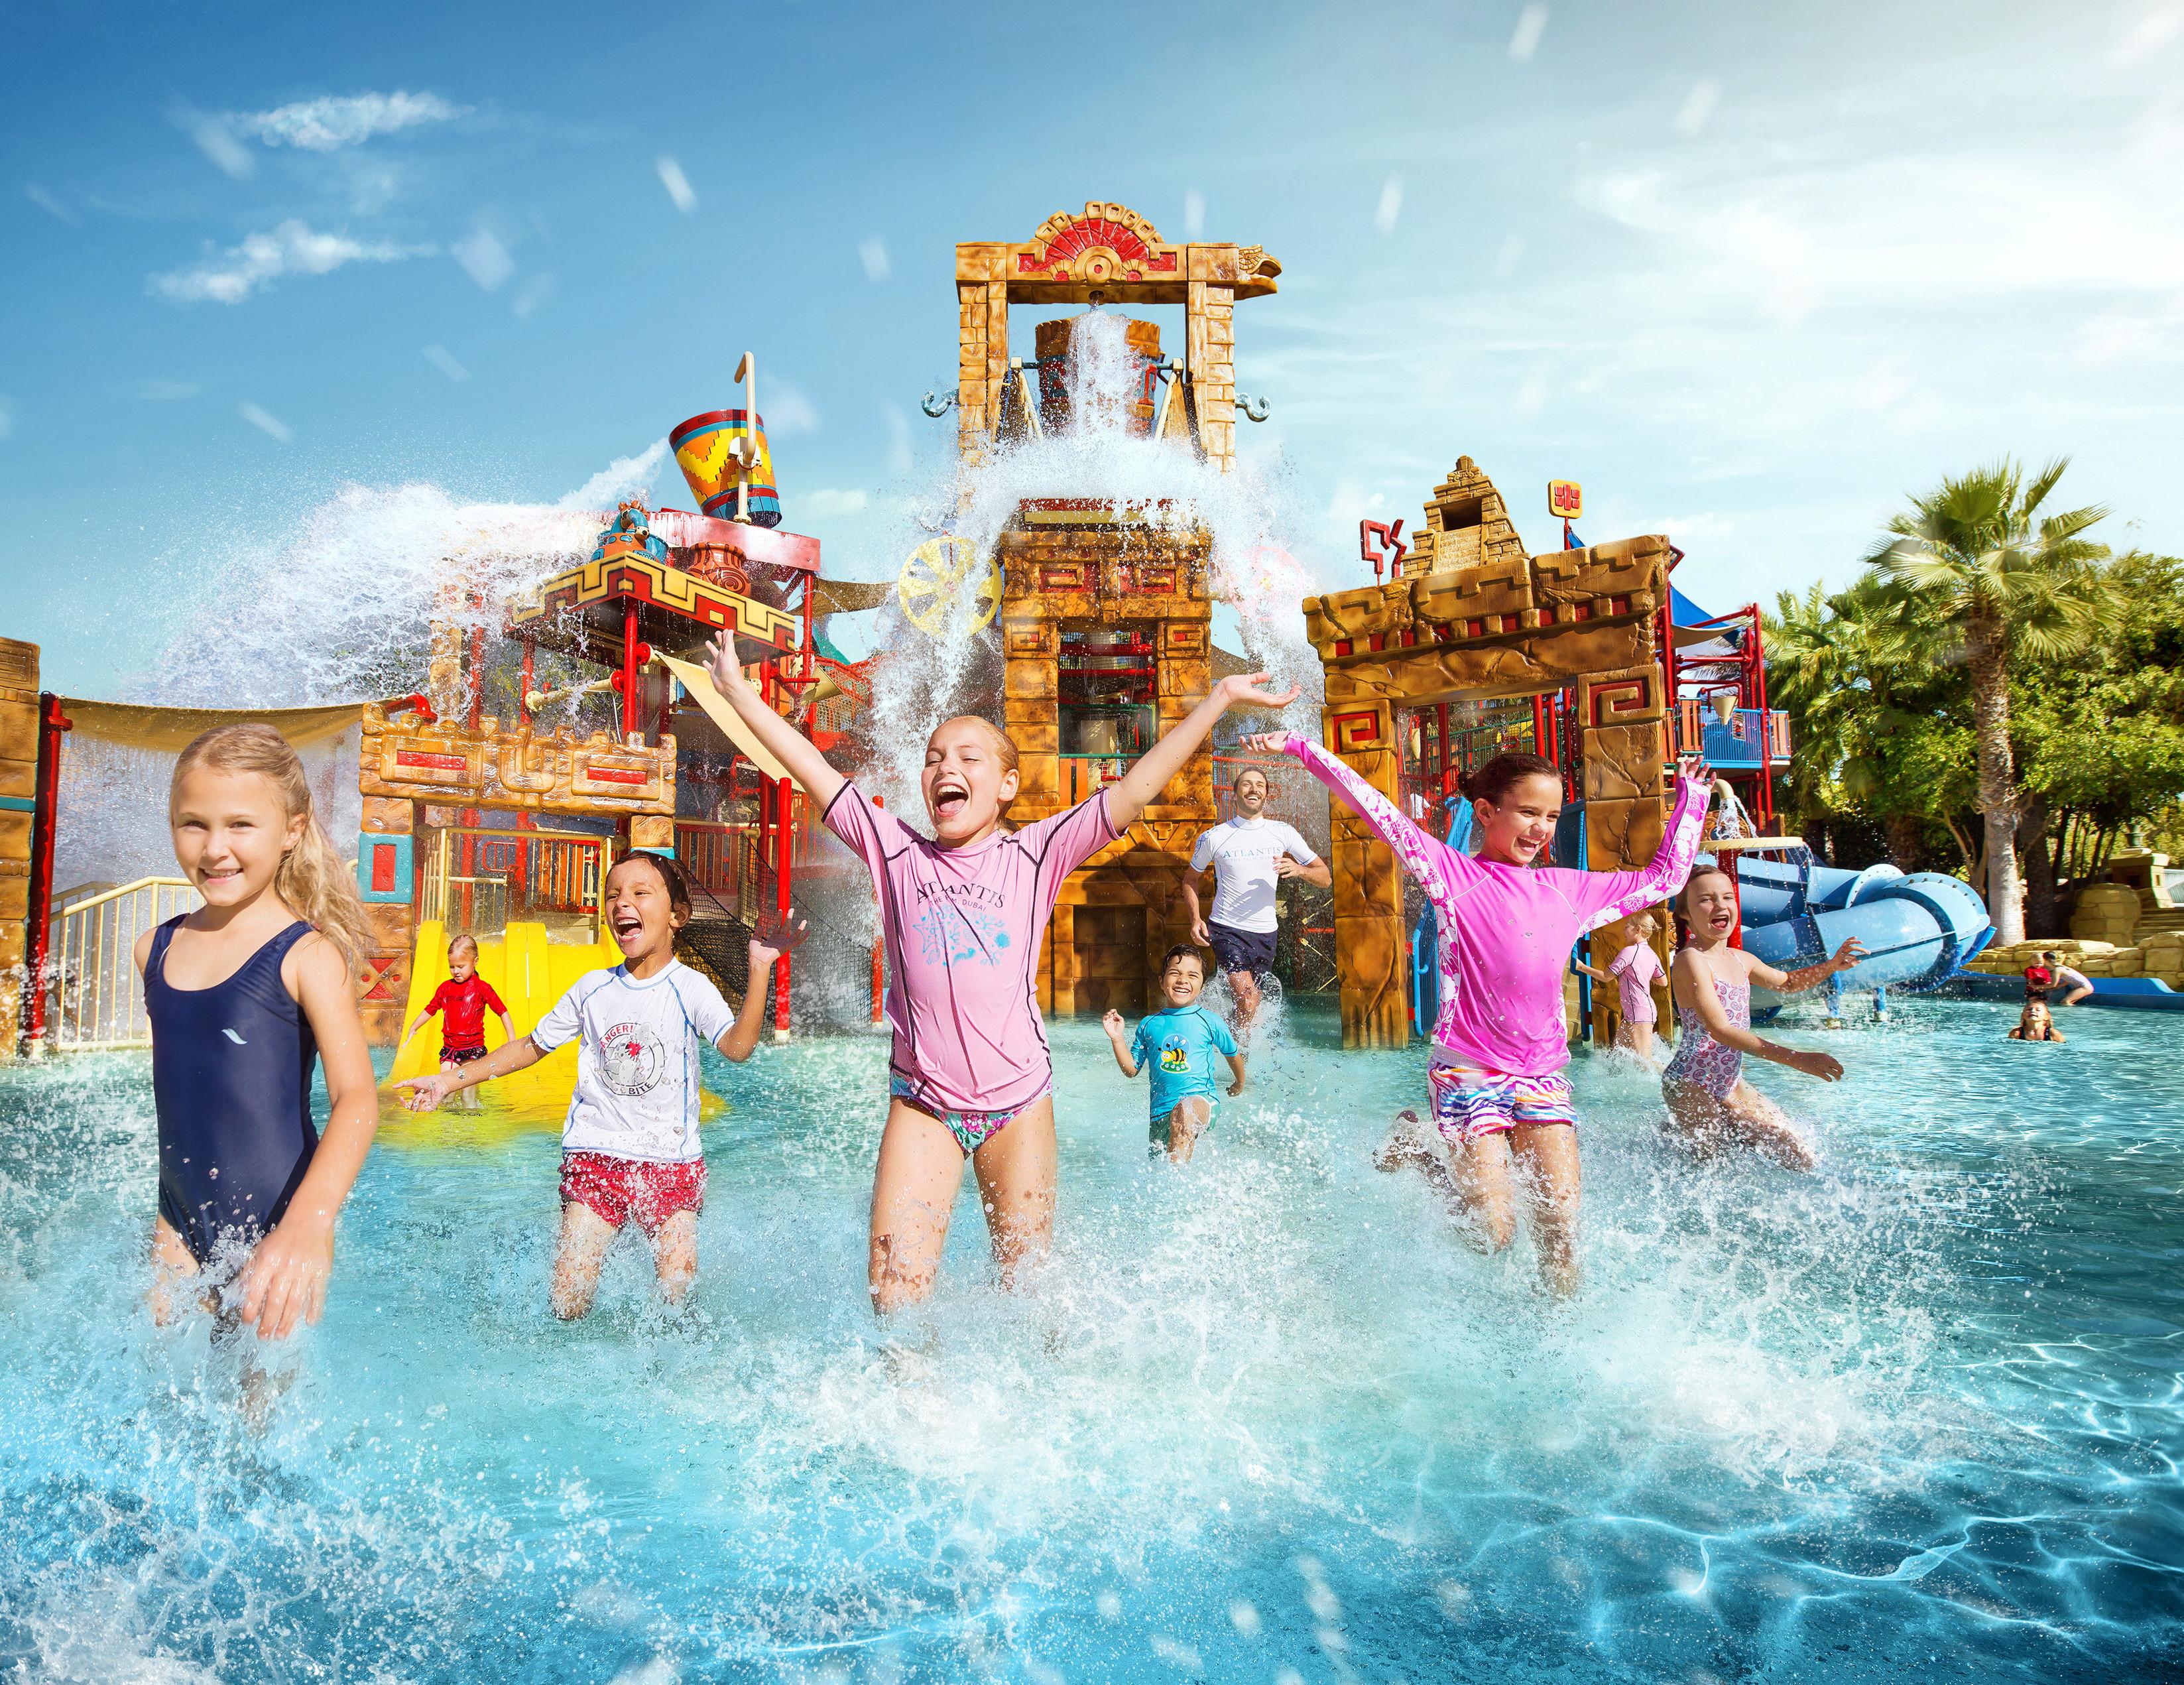 Best Water Slides For Kids